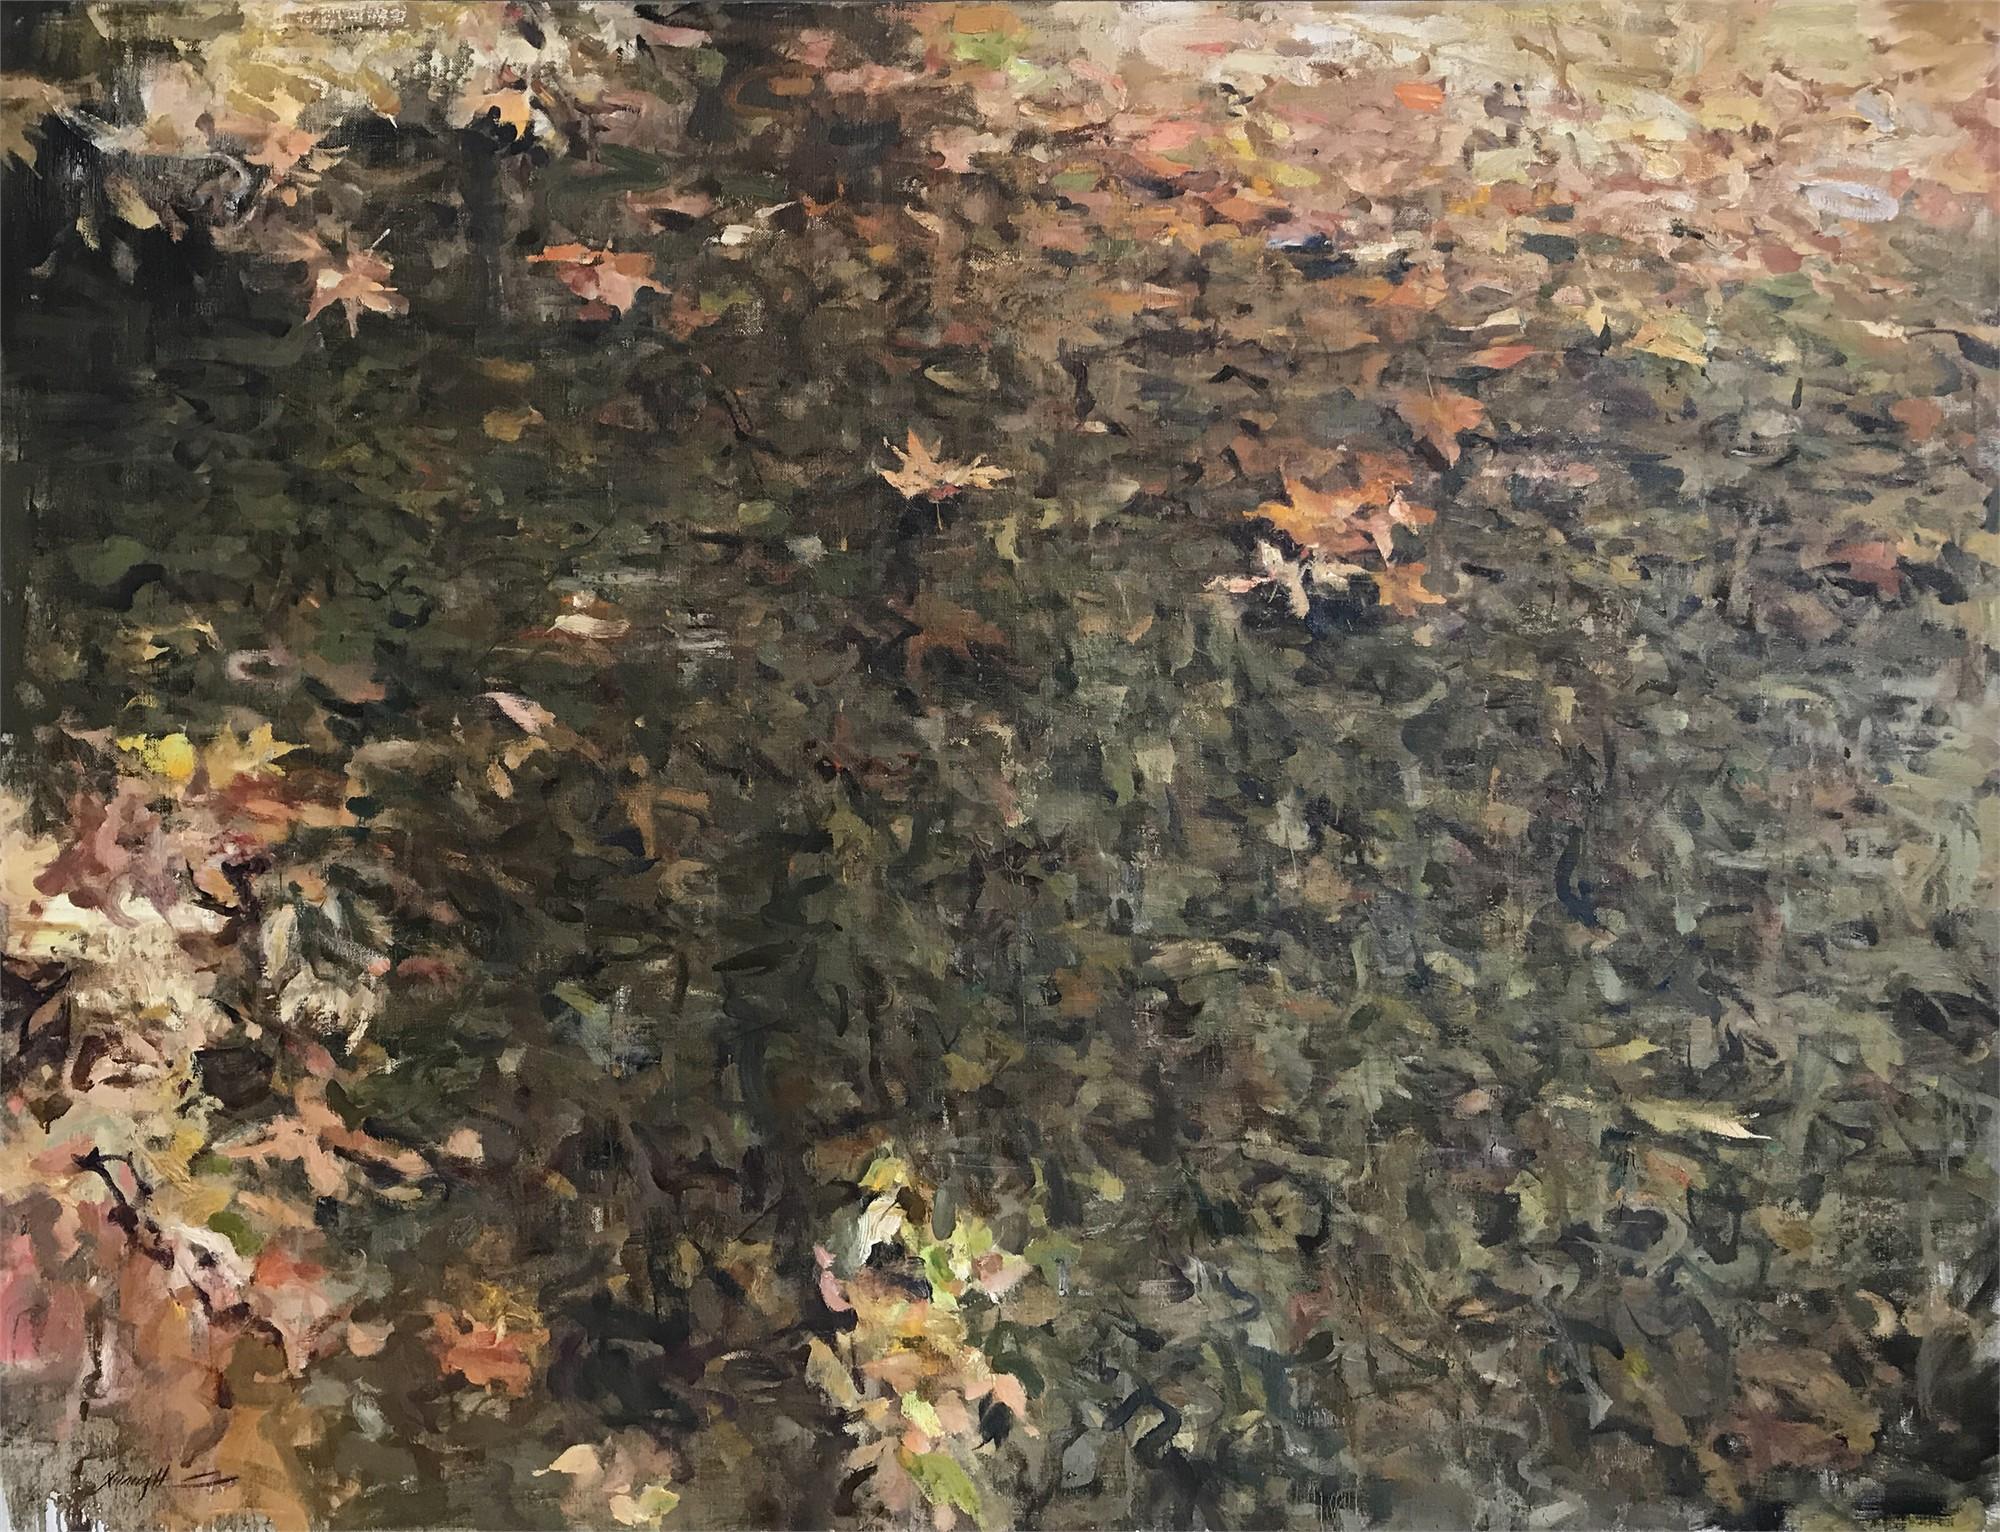 Still Pool by Quang Ho